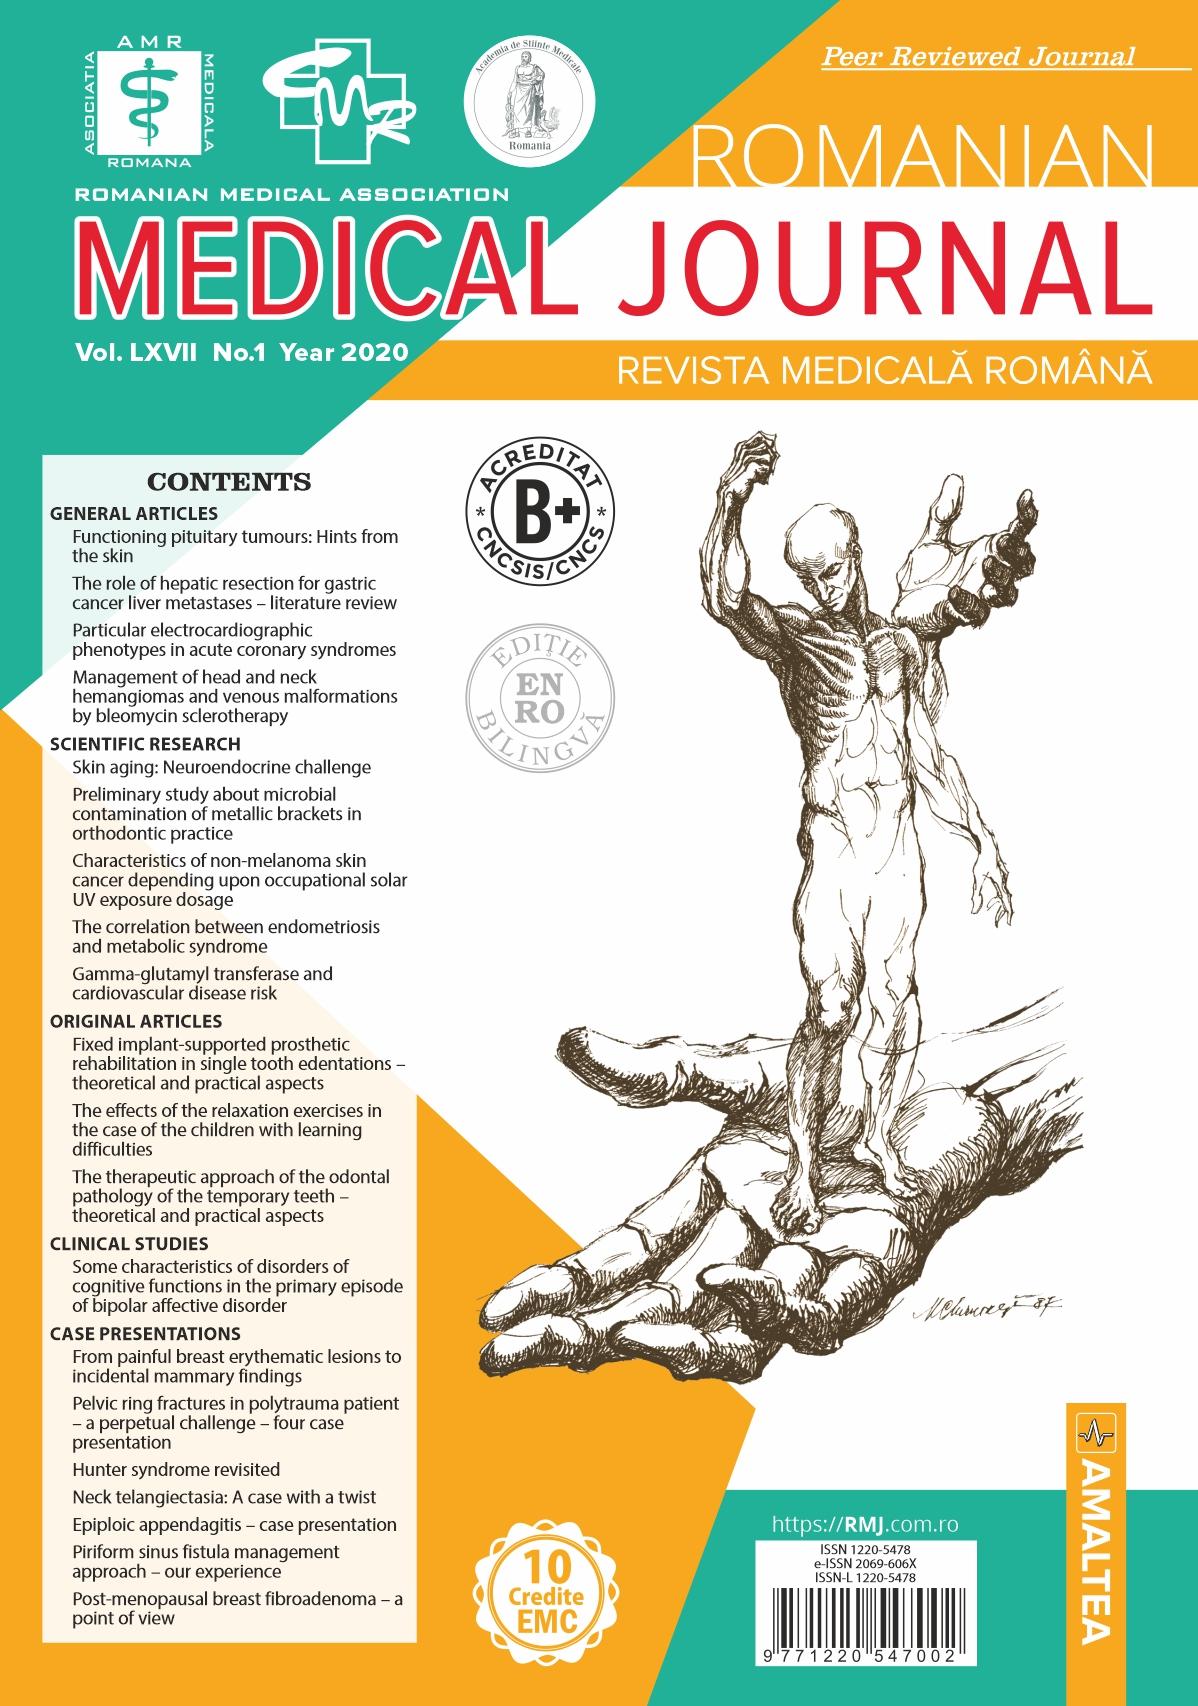 REVISTA MEDICALA ROMANA - Romanian Medical Journal, Vol. LXVII, No. 1, Year 2020